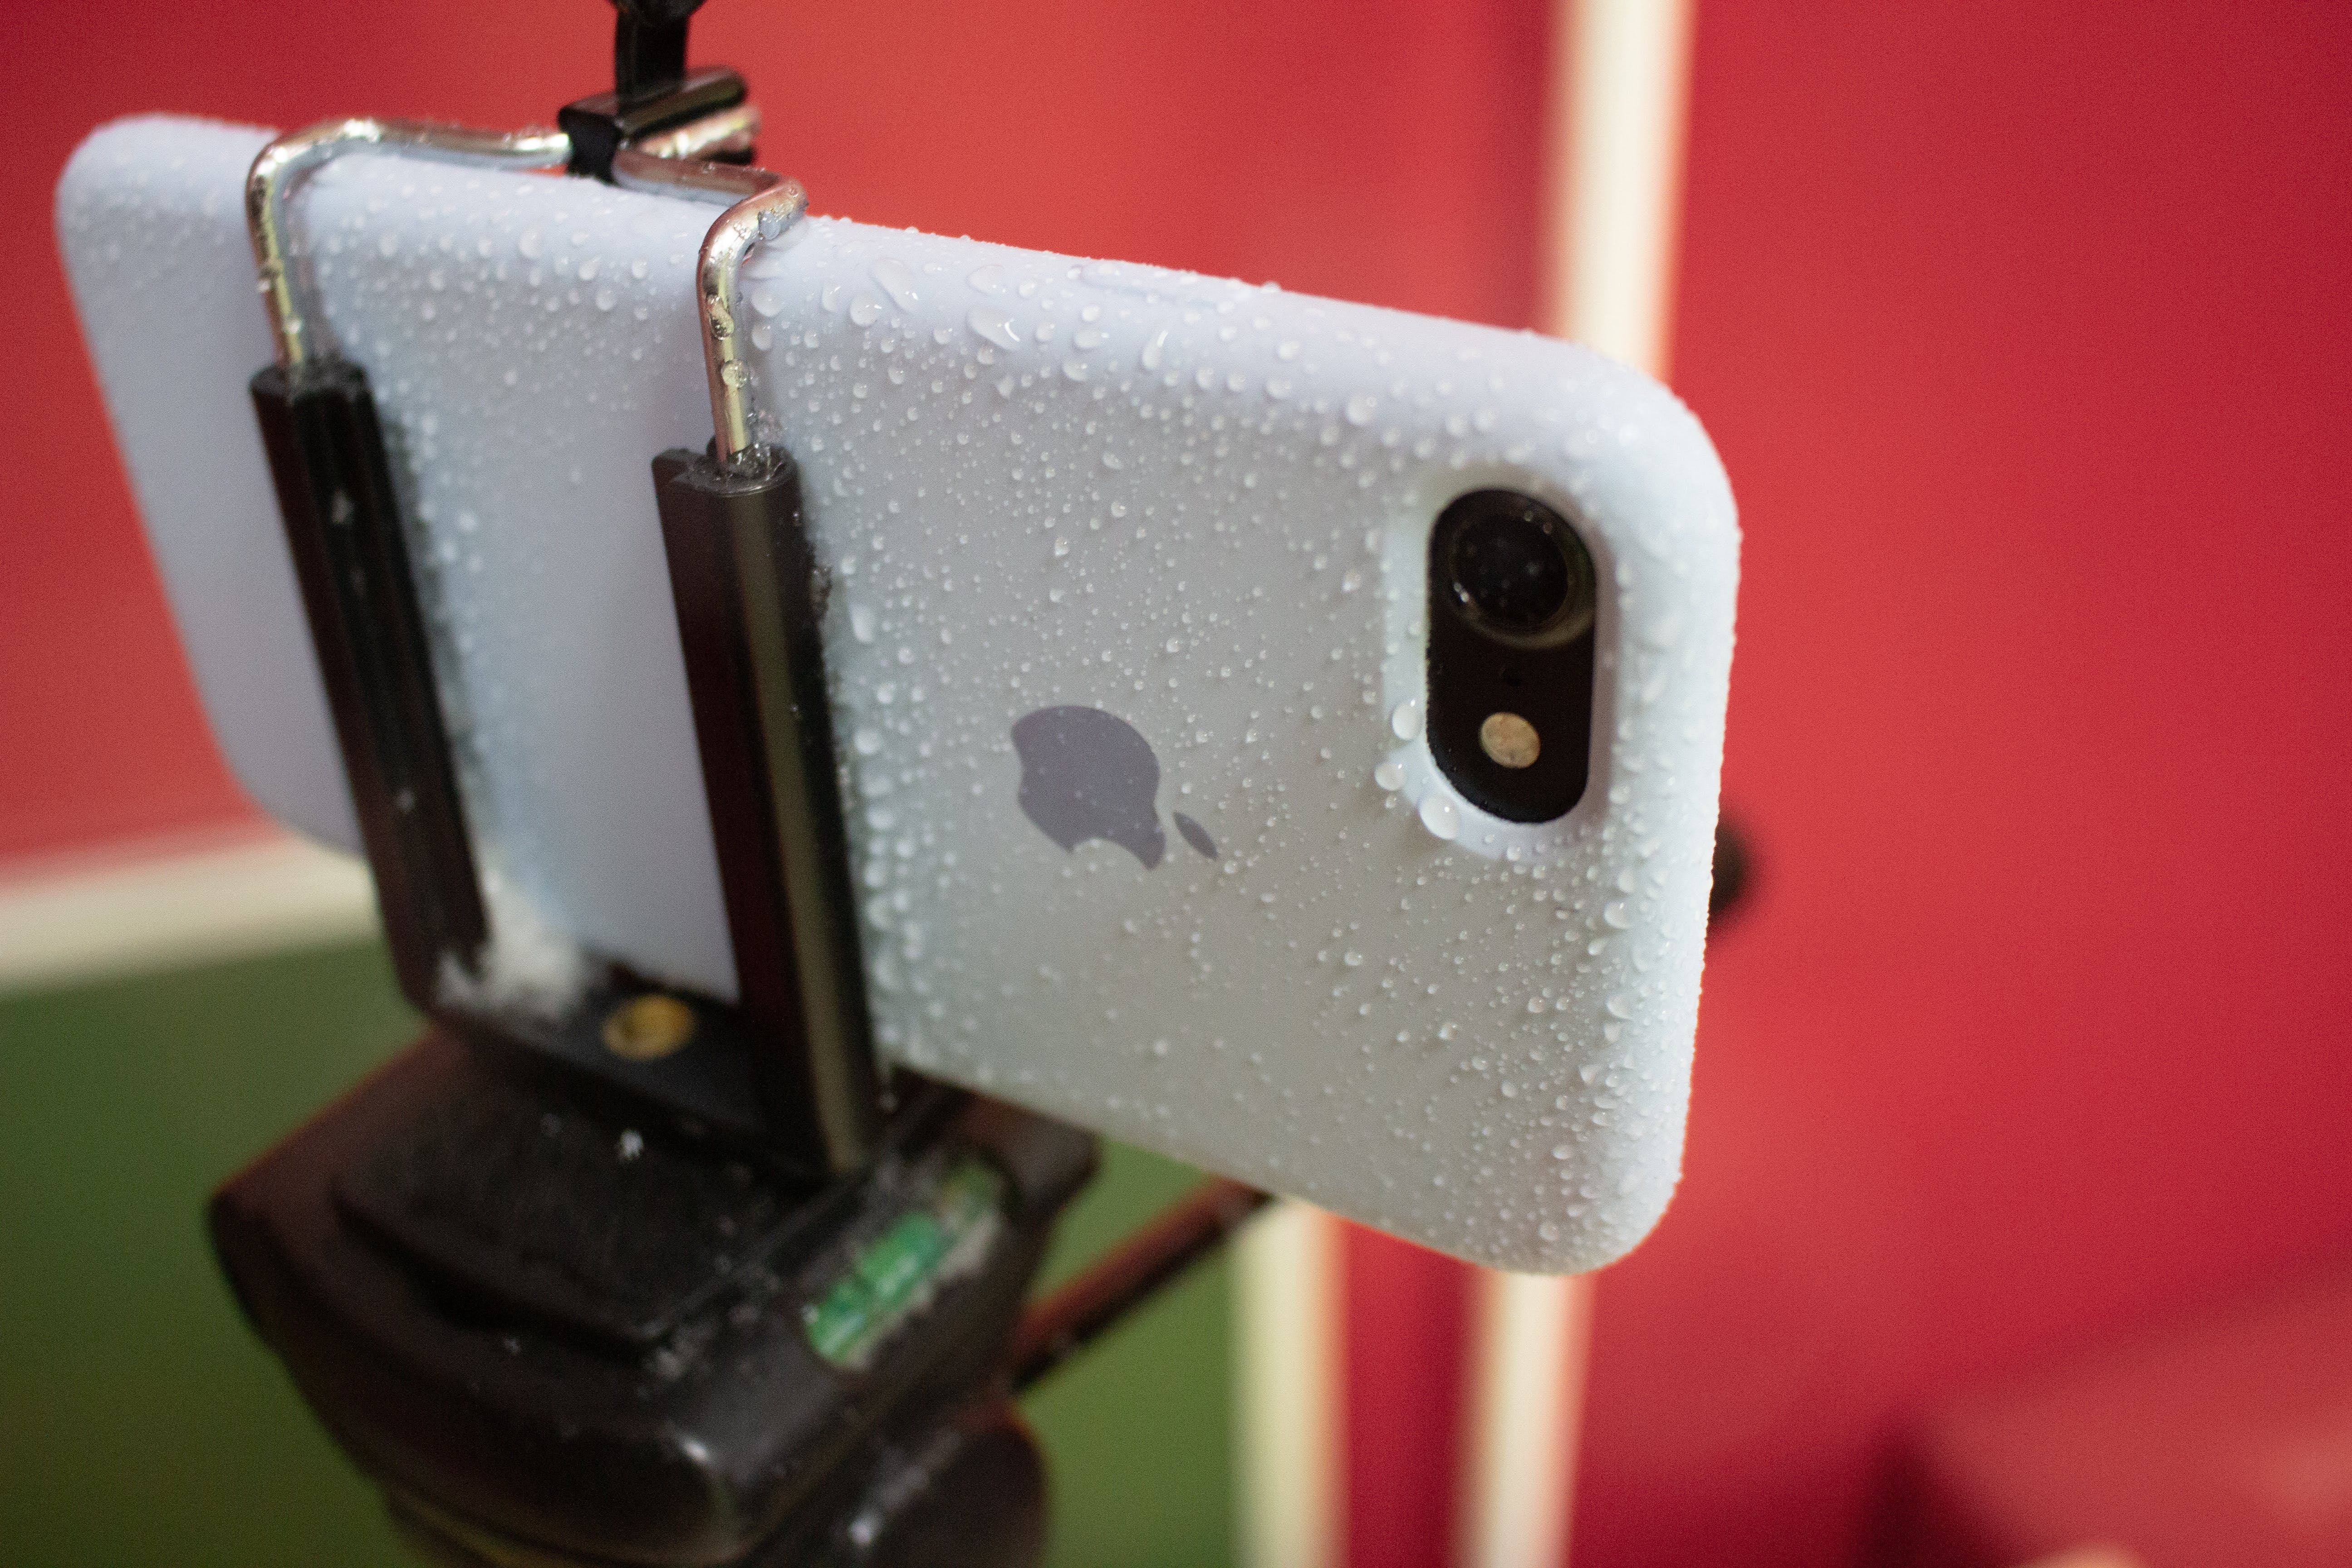 Free stock photo of apple, black, blue, camera